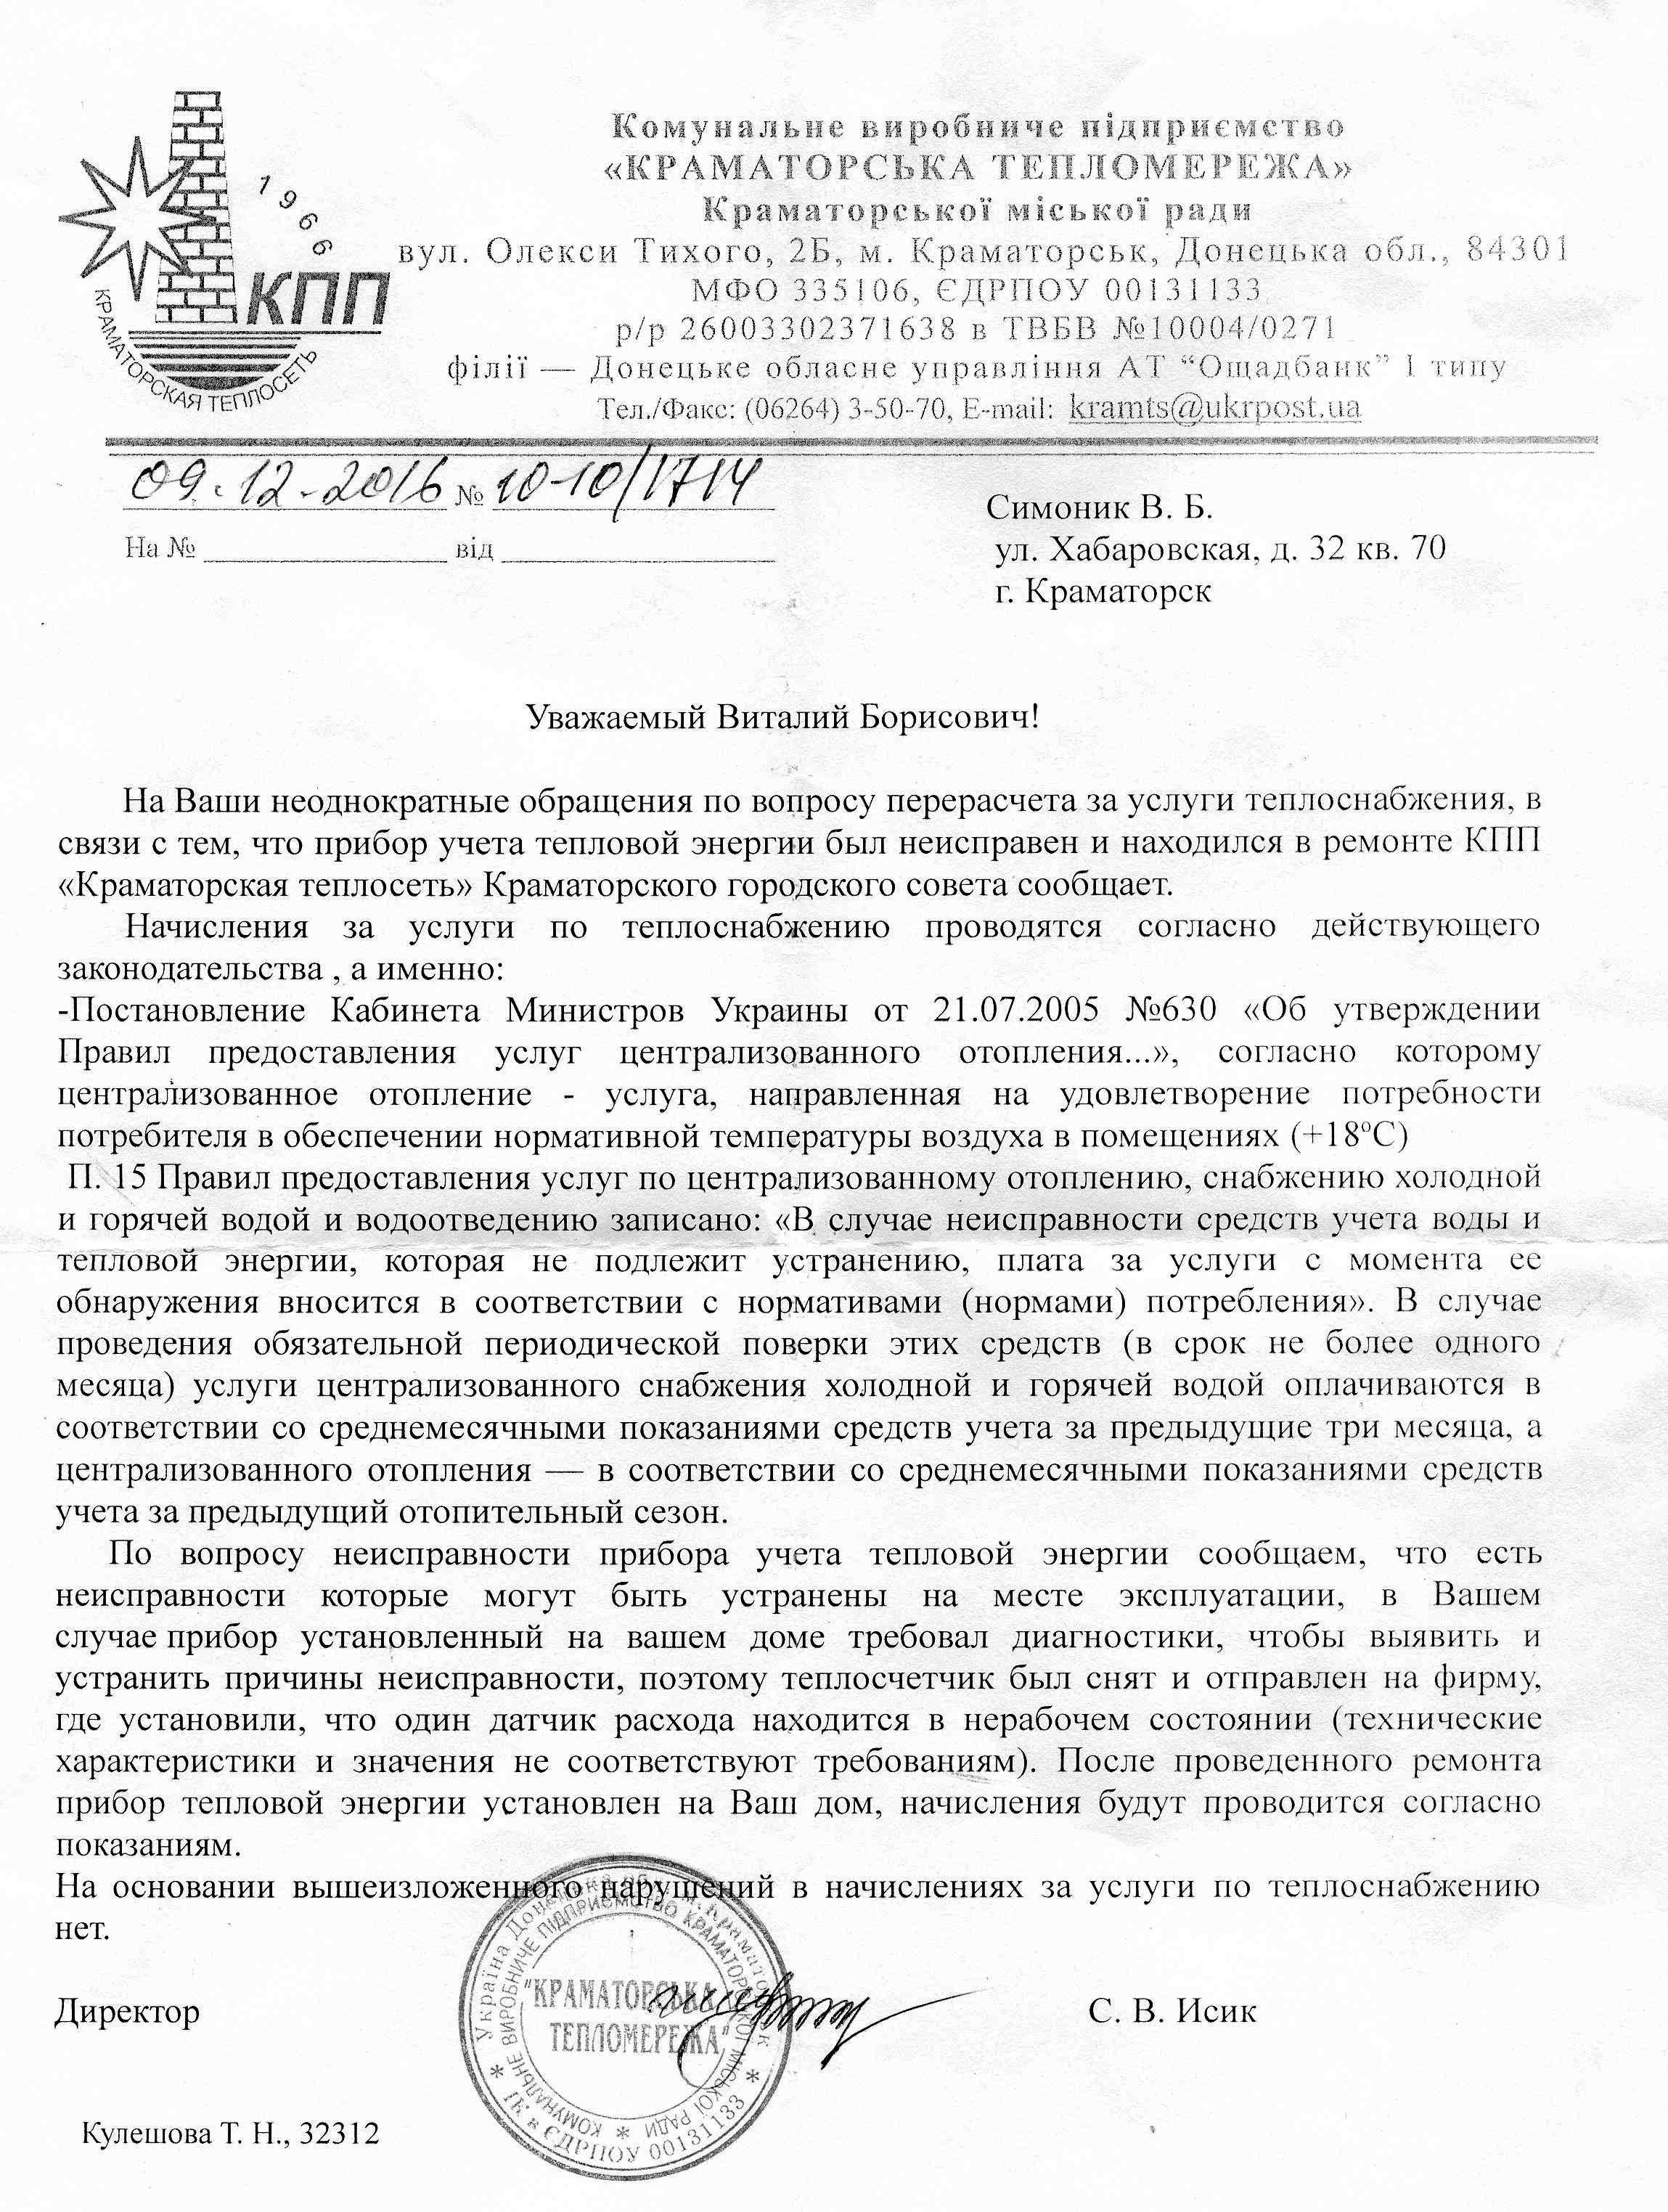 https://img-fotki.yandex.ru/get/131894/248142895.0/0_180fb1_c1a9f620_orig